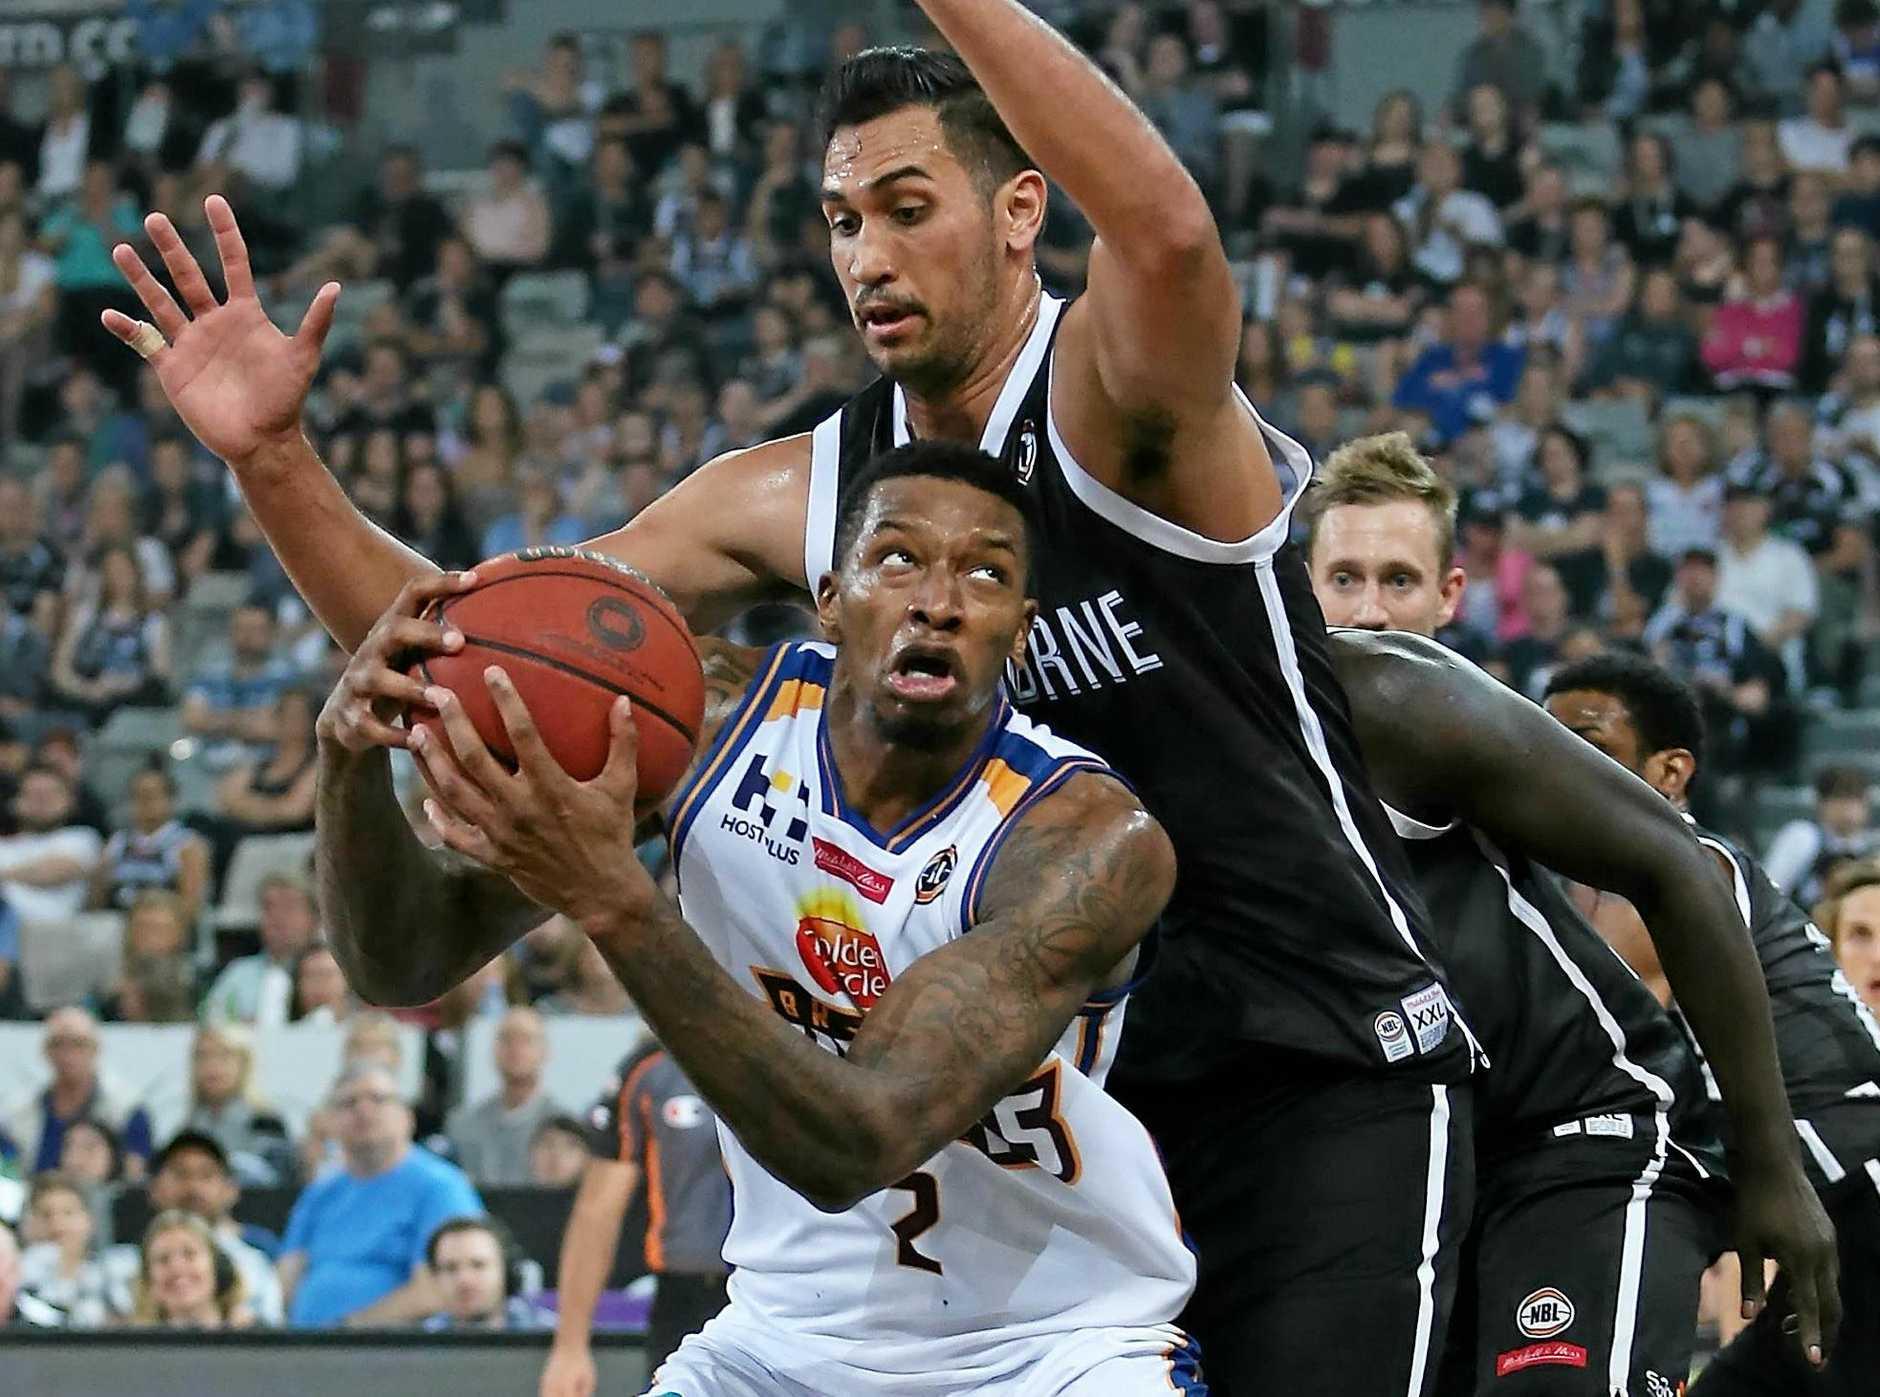 Torrey Craig of the Brisbane Bullets drives to the basket against Melbourne United.